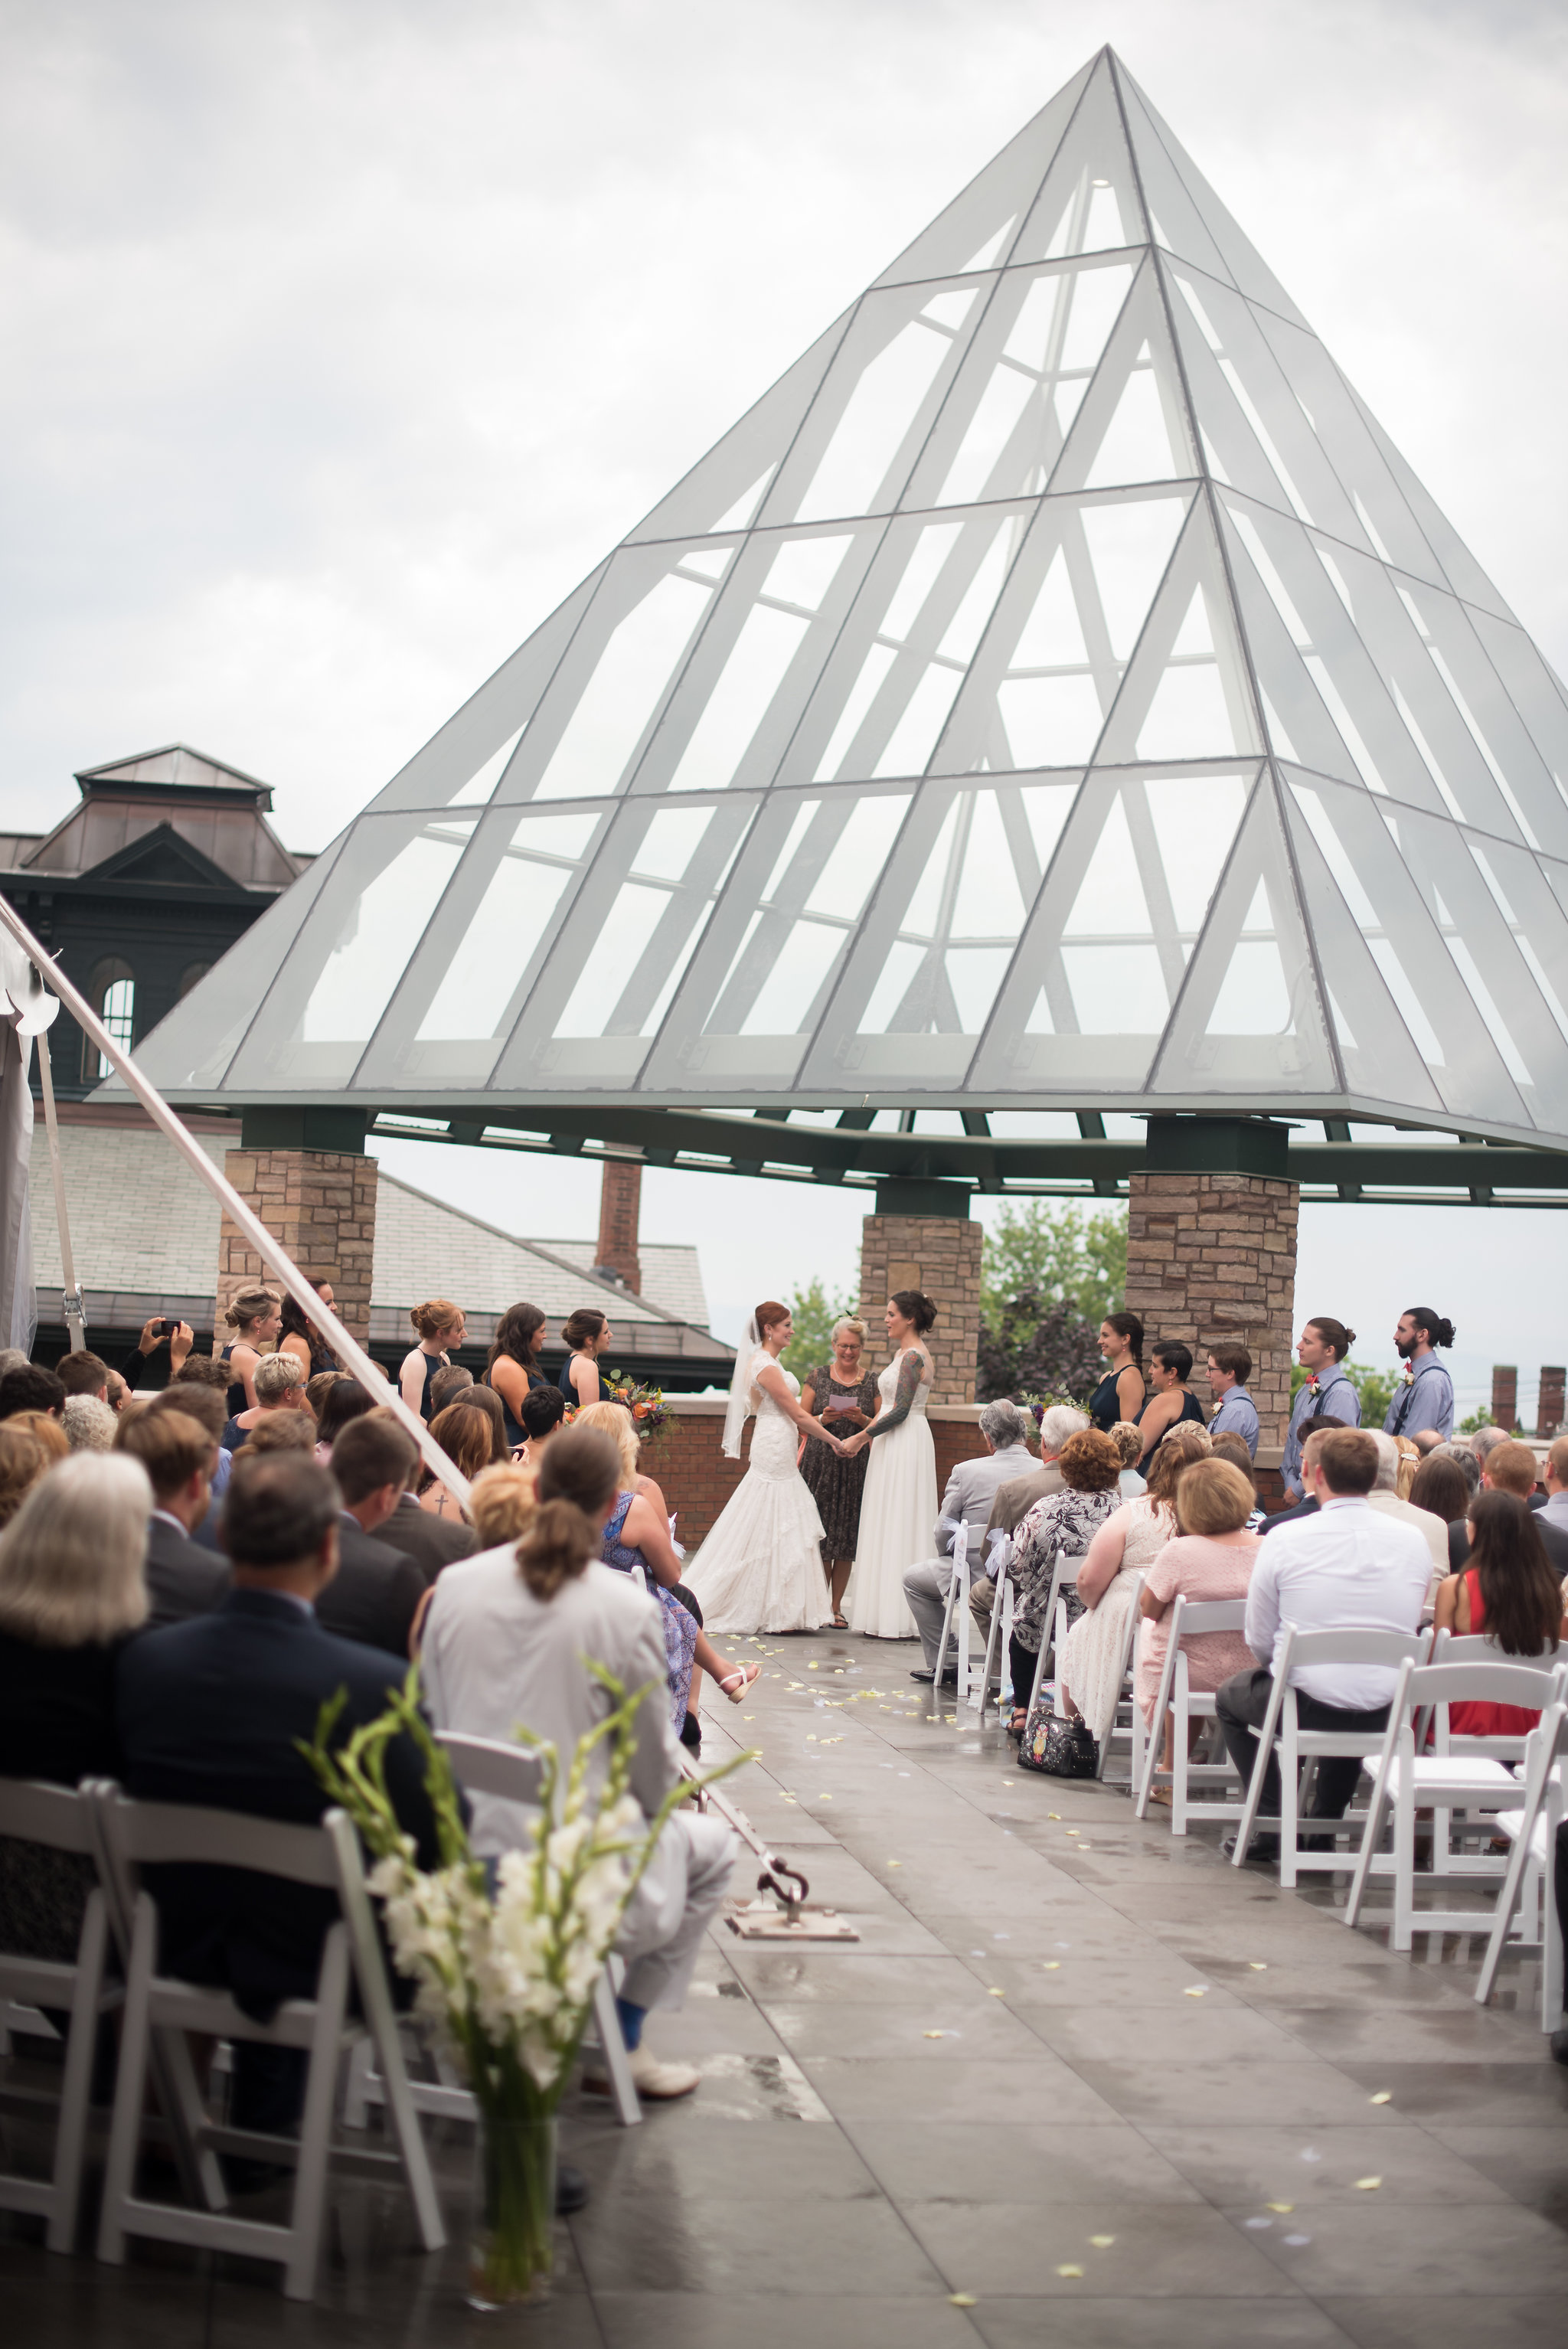 burlington-vermont-wedding-photographer-sarah-annay-photography.jpg1.jpg